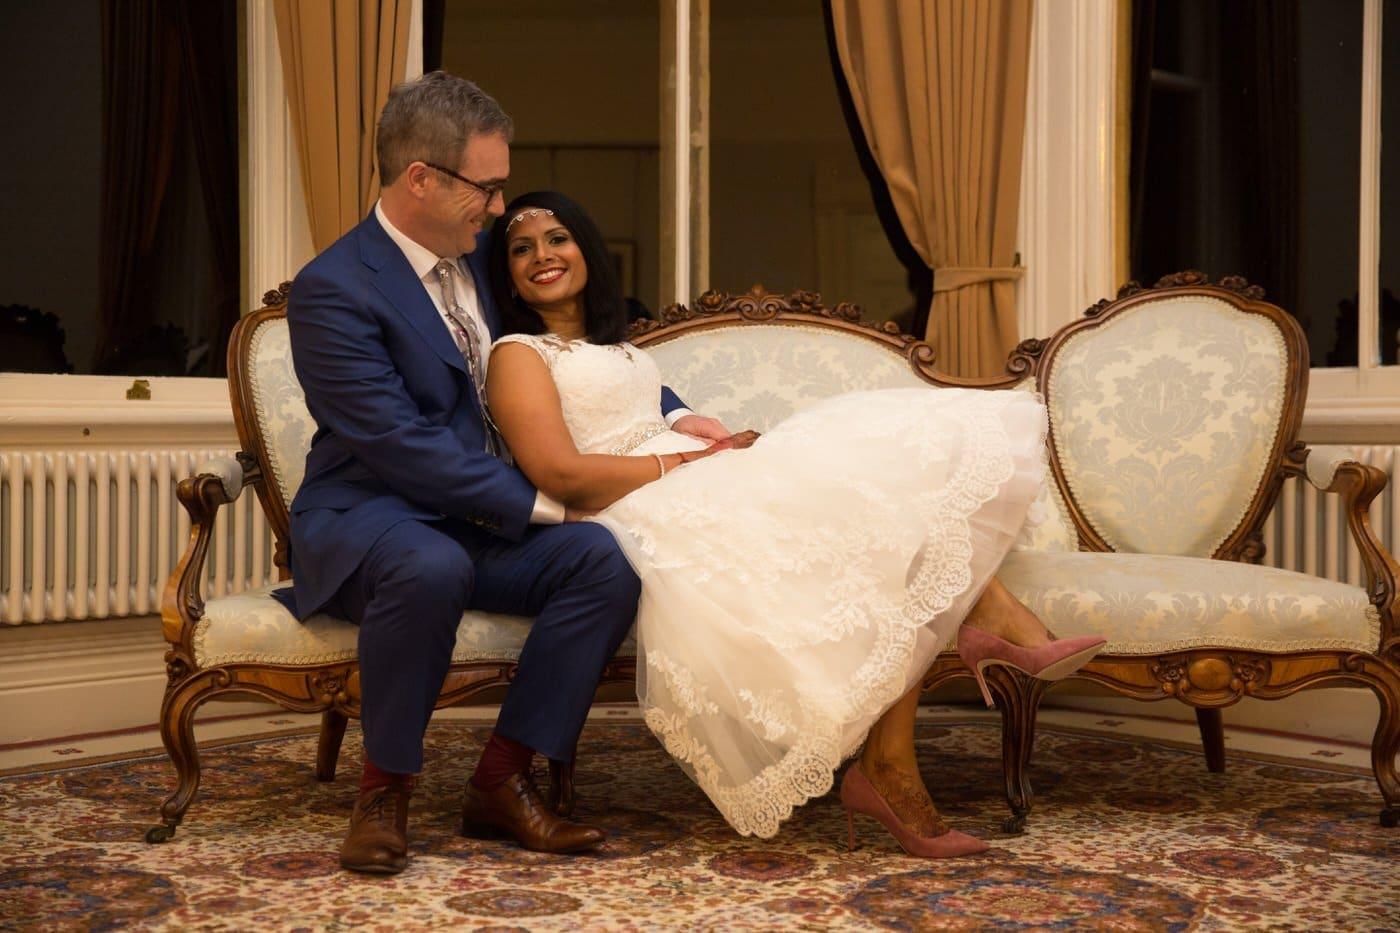 Hindu Wedding Photography and Videography at Highbury Hall // Dinah and Andy